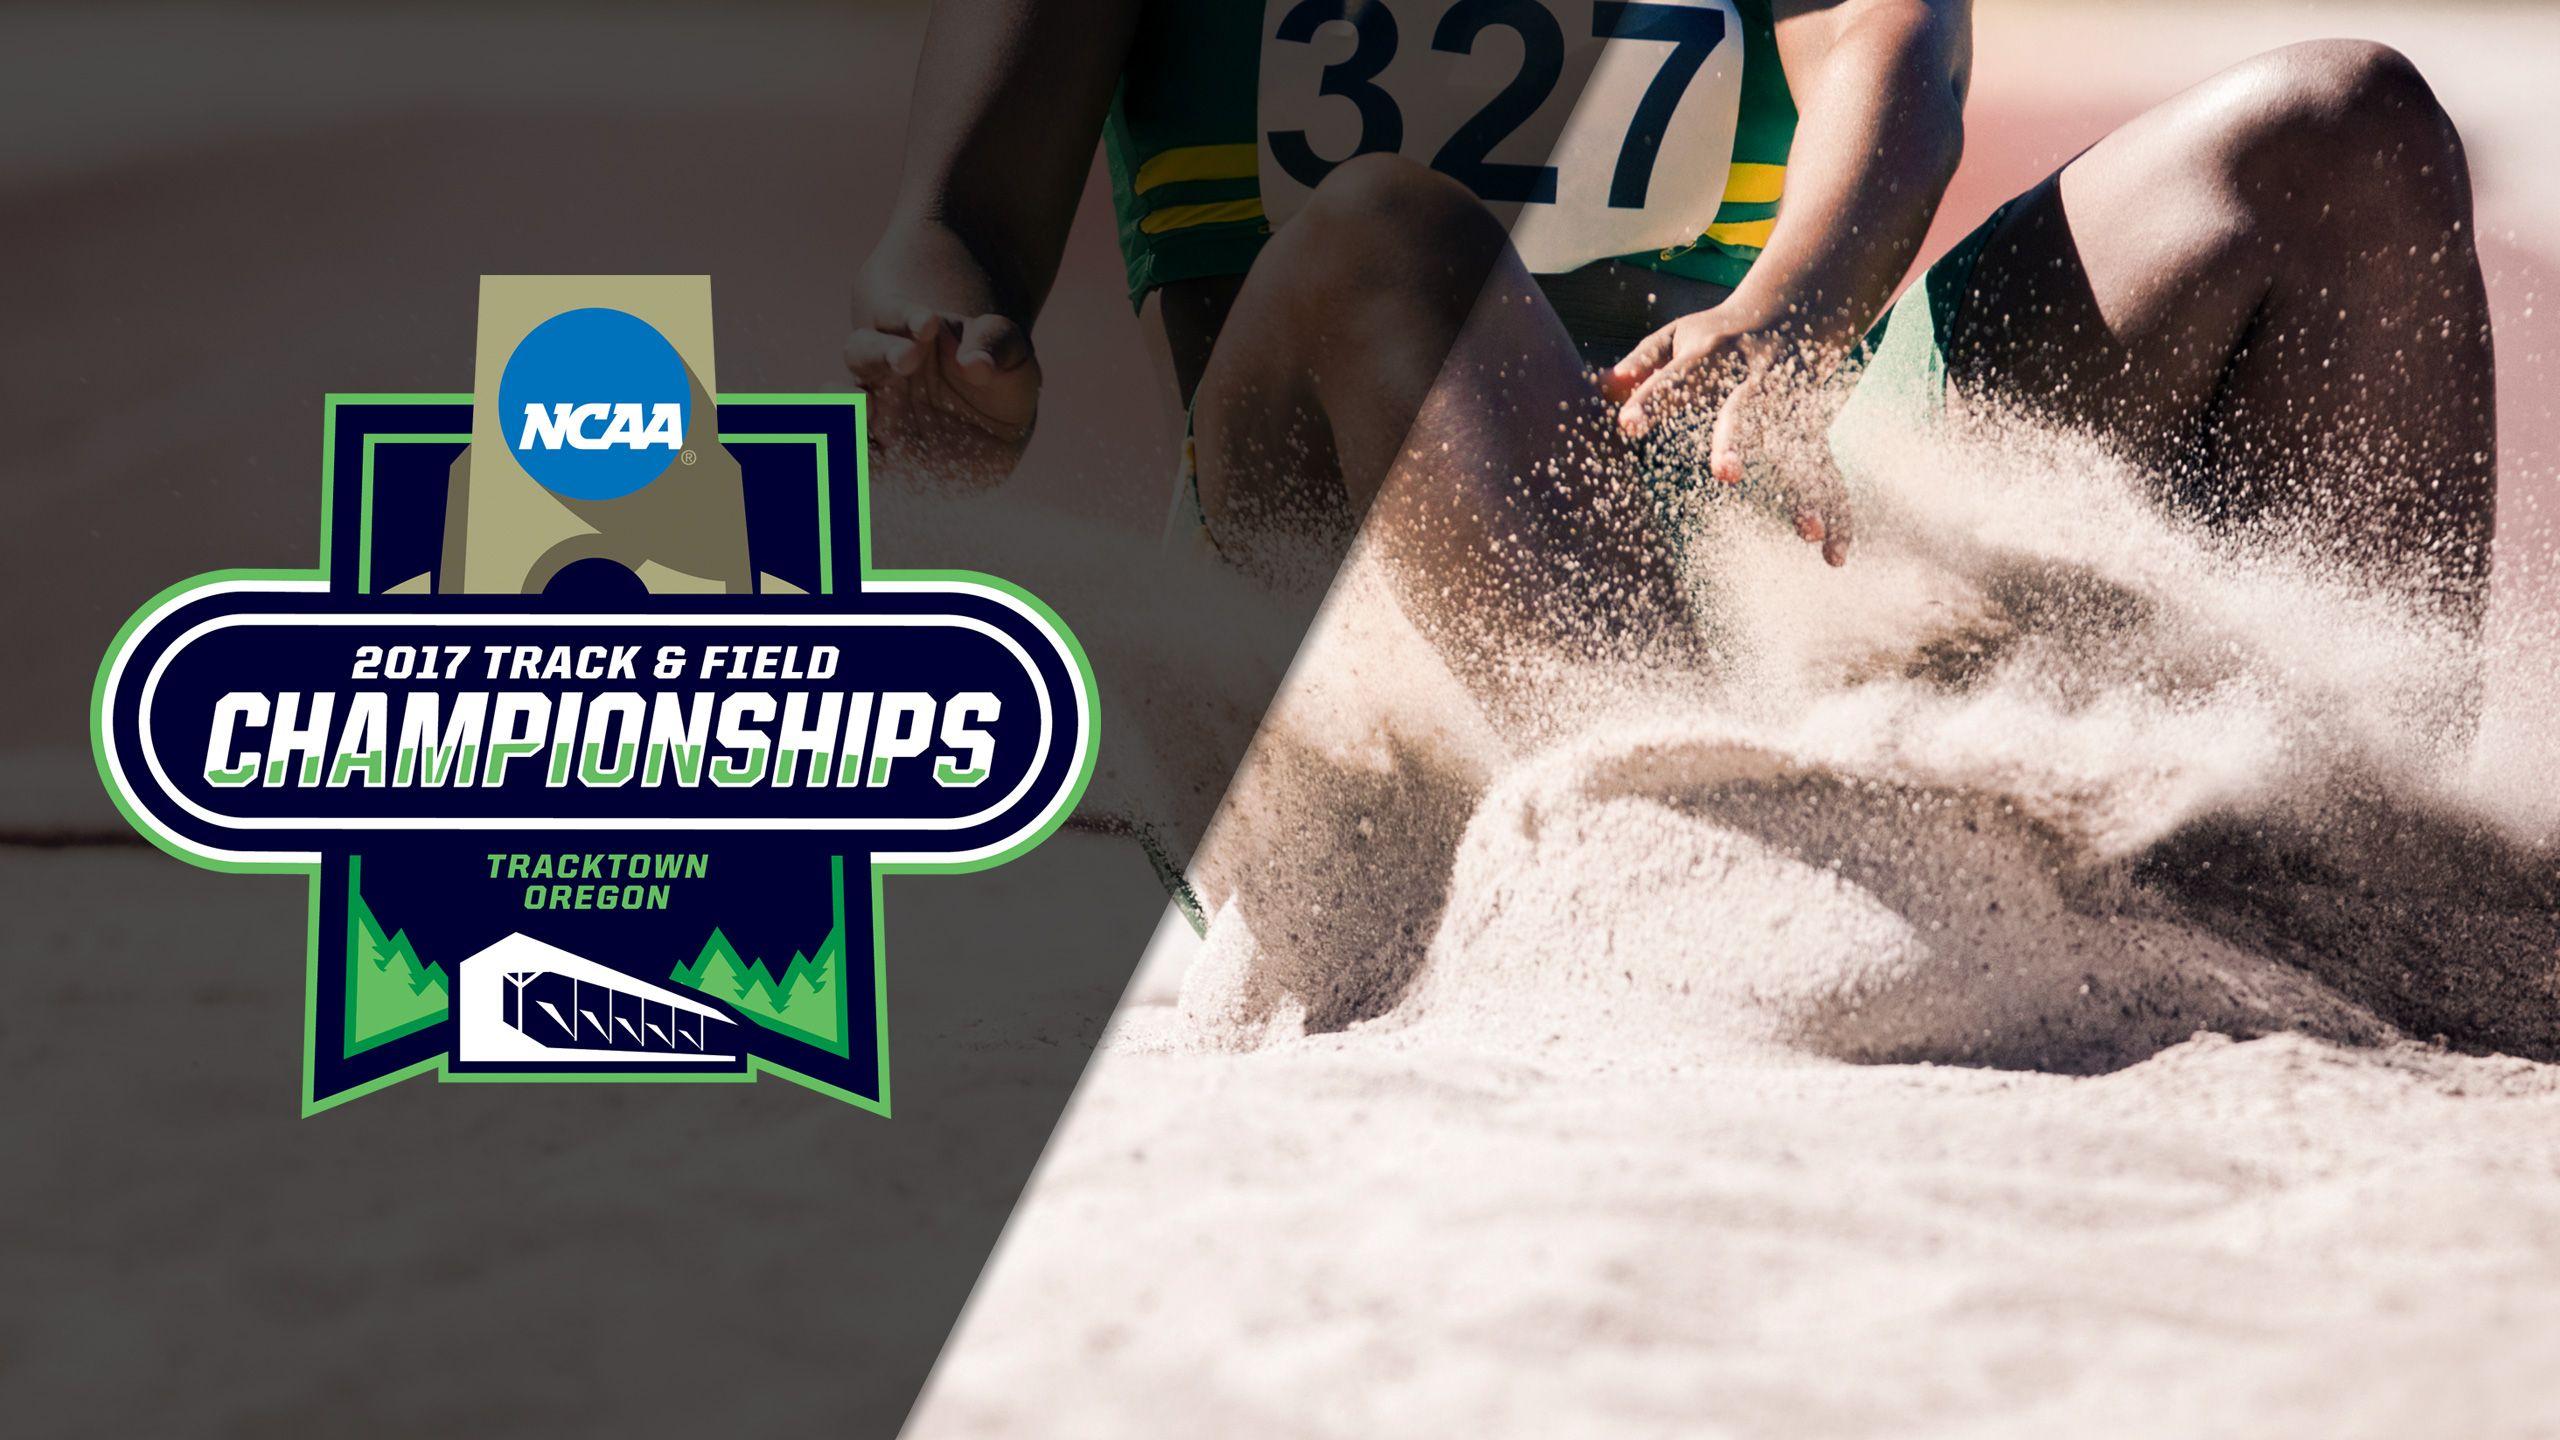 NCAA Track & Field Outdoor Championships - Women's Long Jump Trials (Flight 2) & Final